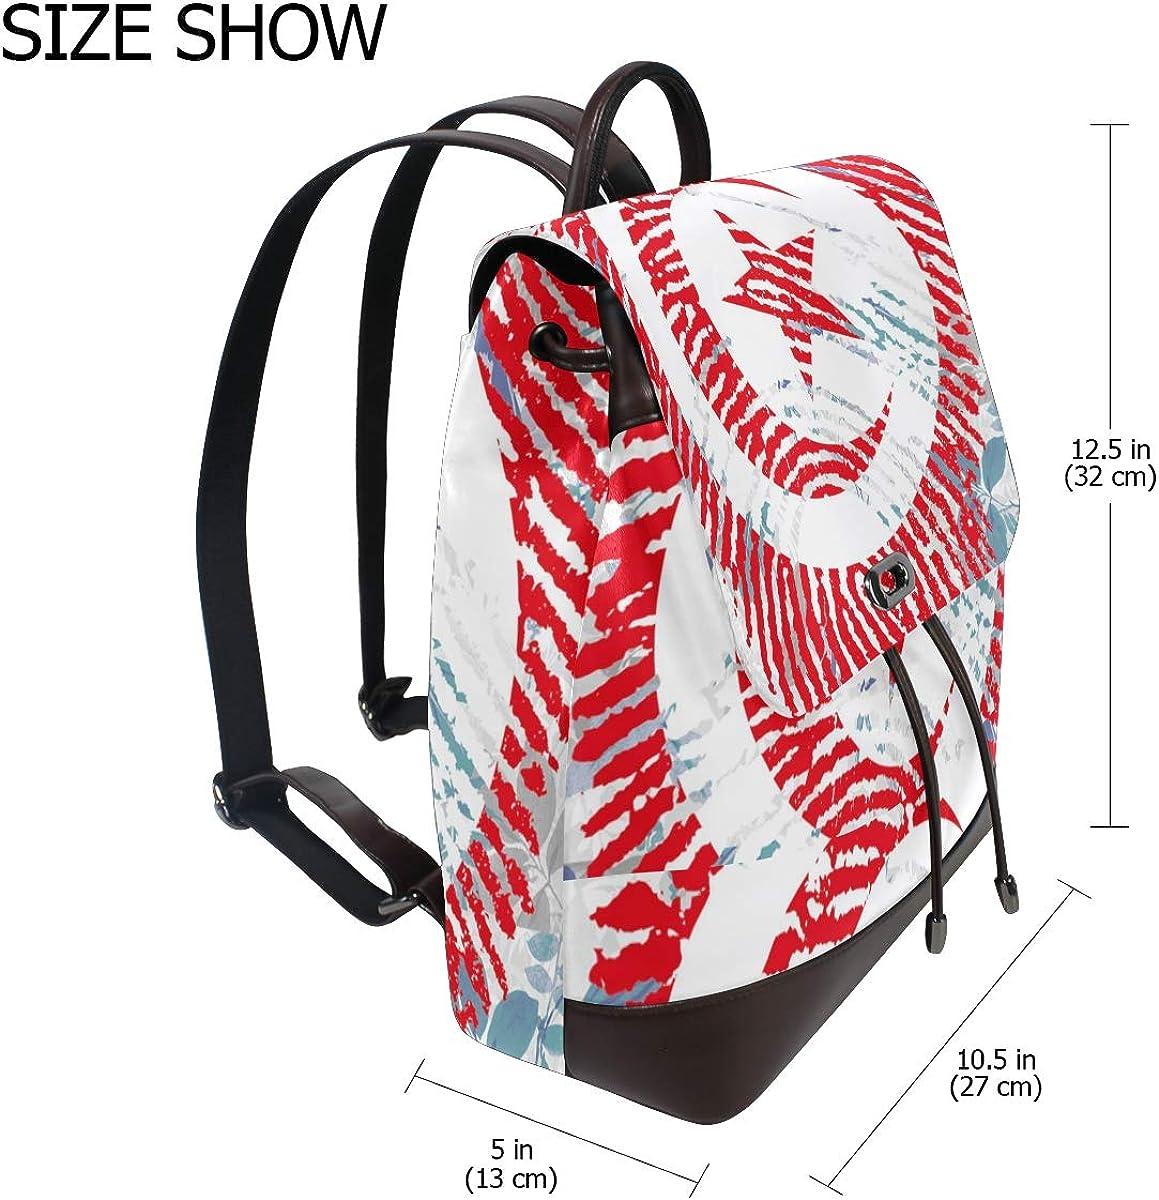 PU Leather Shoulder Bag,Fingerprint Tunisia Flag Backpack,Portable Travel School Rucksack,Satchel with Top Handle